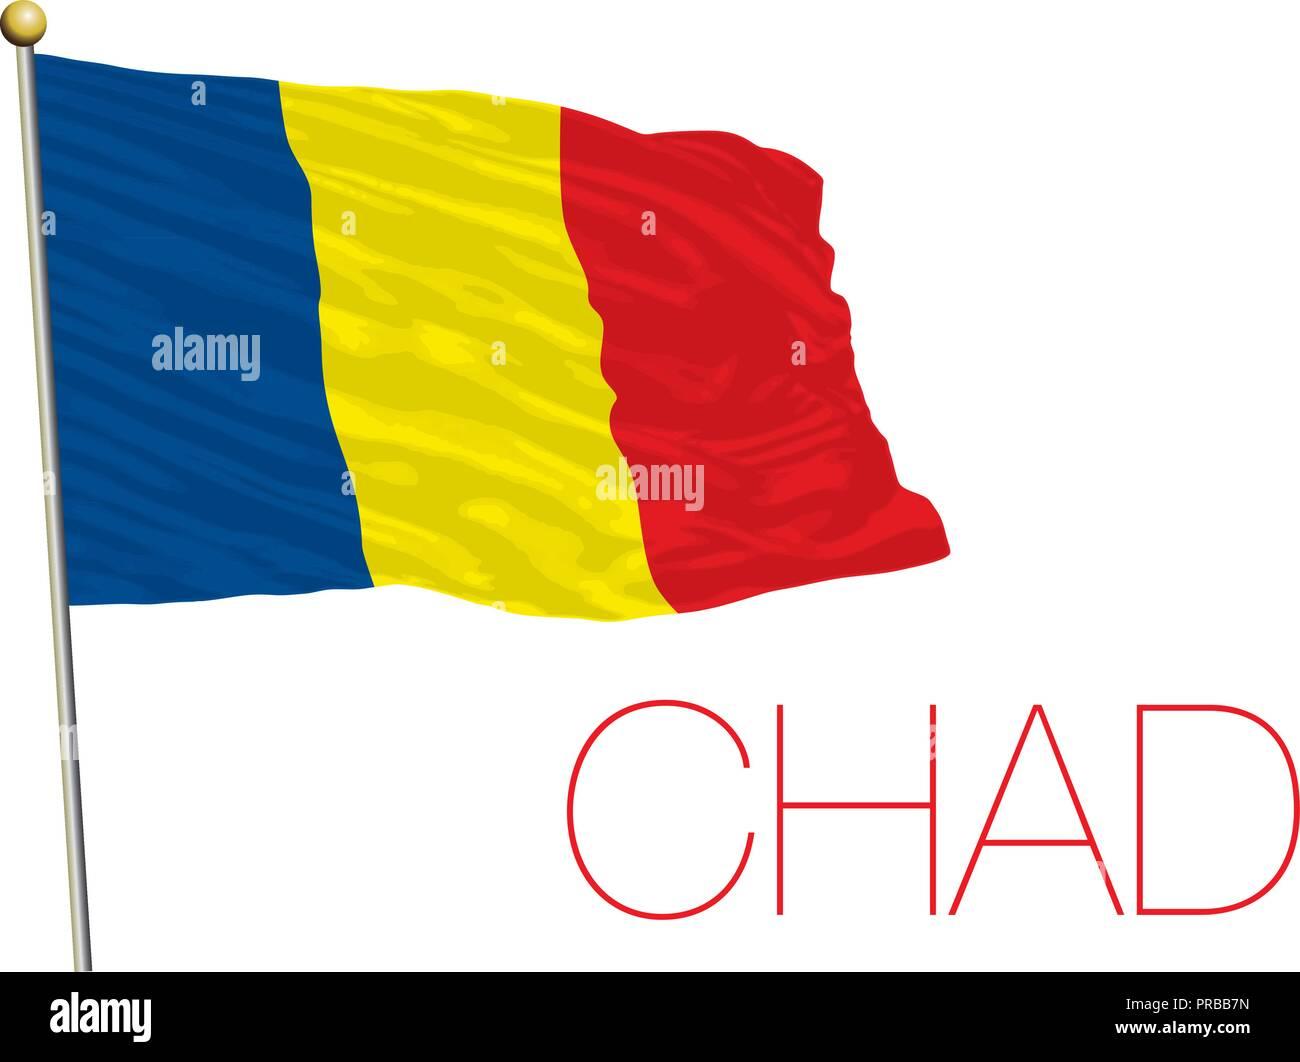 Chad flag, vector illustration - Stock Image